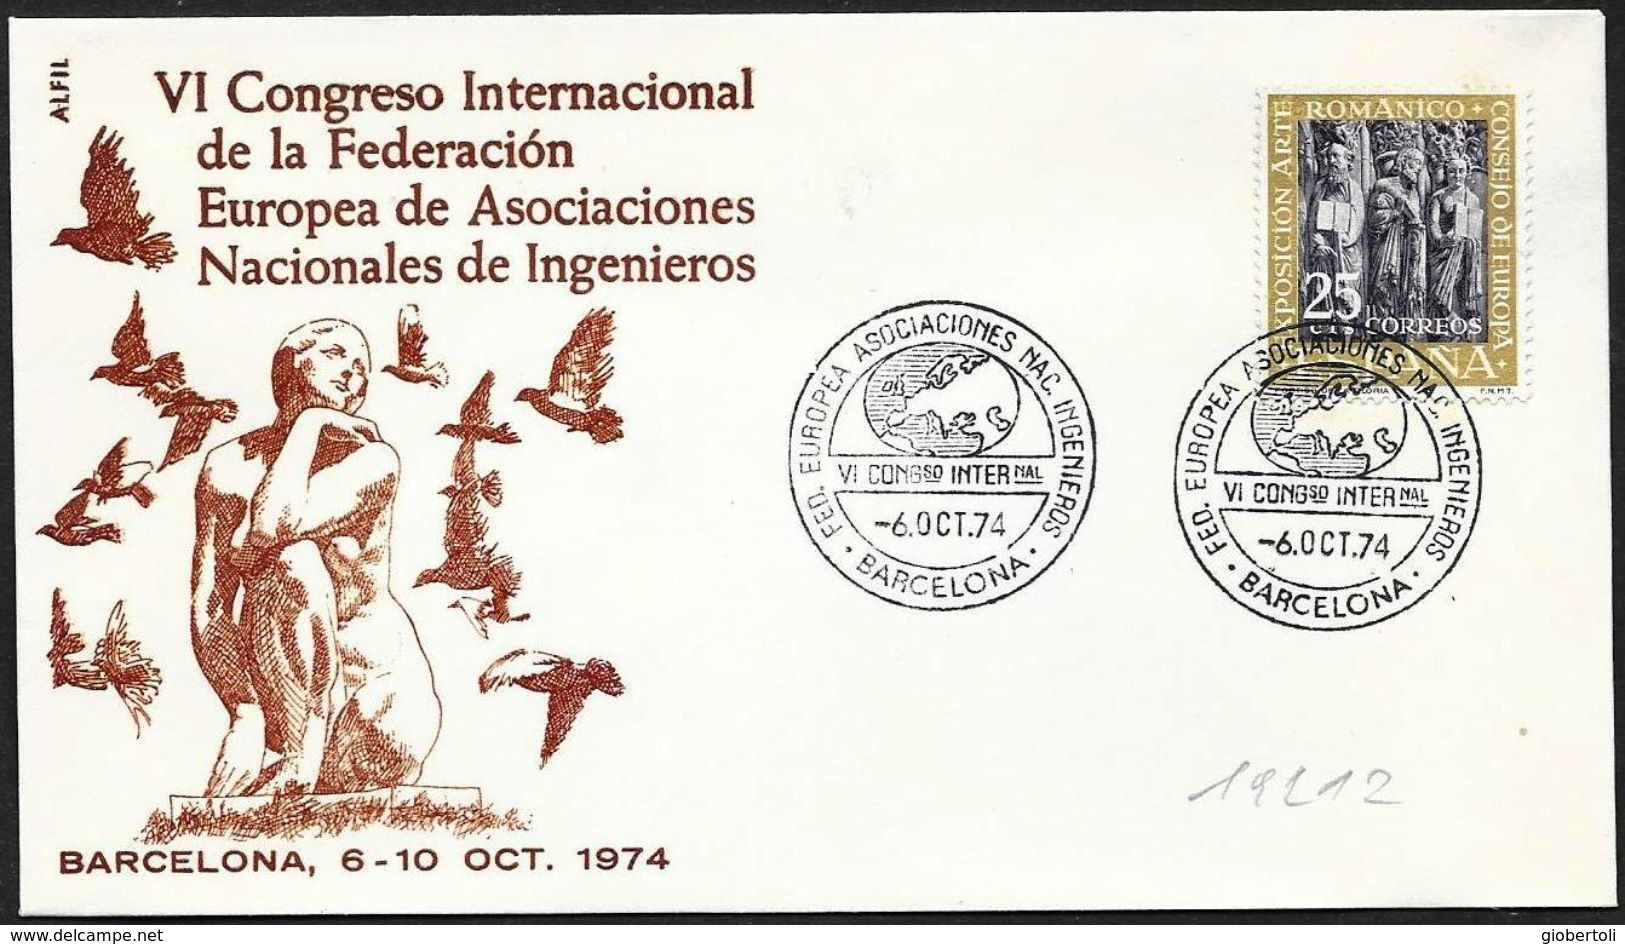 Spagna/Spain/Espagne: Associazione Ingegneri, Association Des Ingénieurs, Association Of Engineers, Mappa, Map, Carte - Berufe